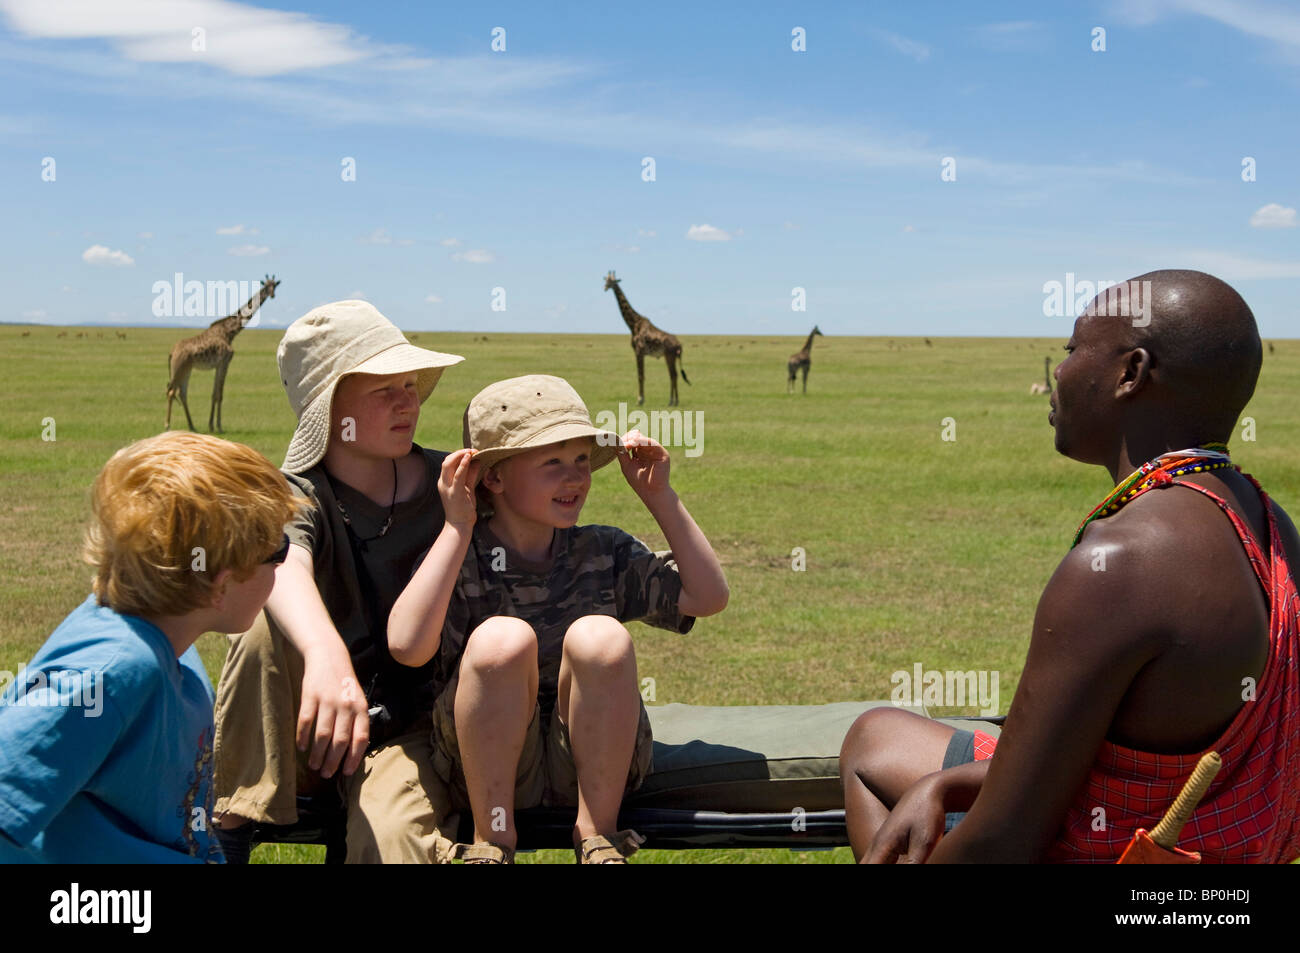 Kenya, Masai Mara. Safari guide, Salaash Ole talks to boys on safari during a game drive out on the plains. (MR) - Stock Image